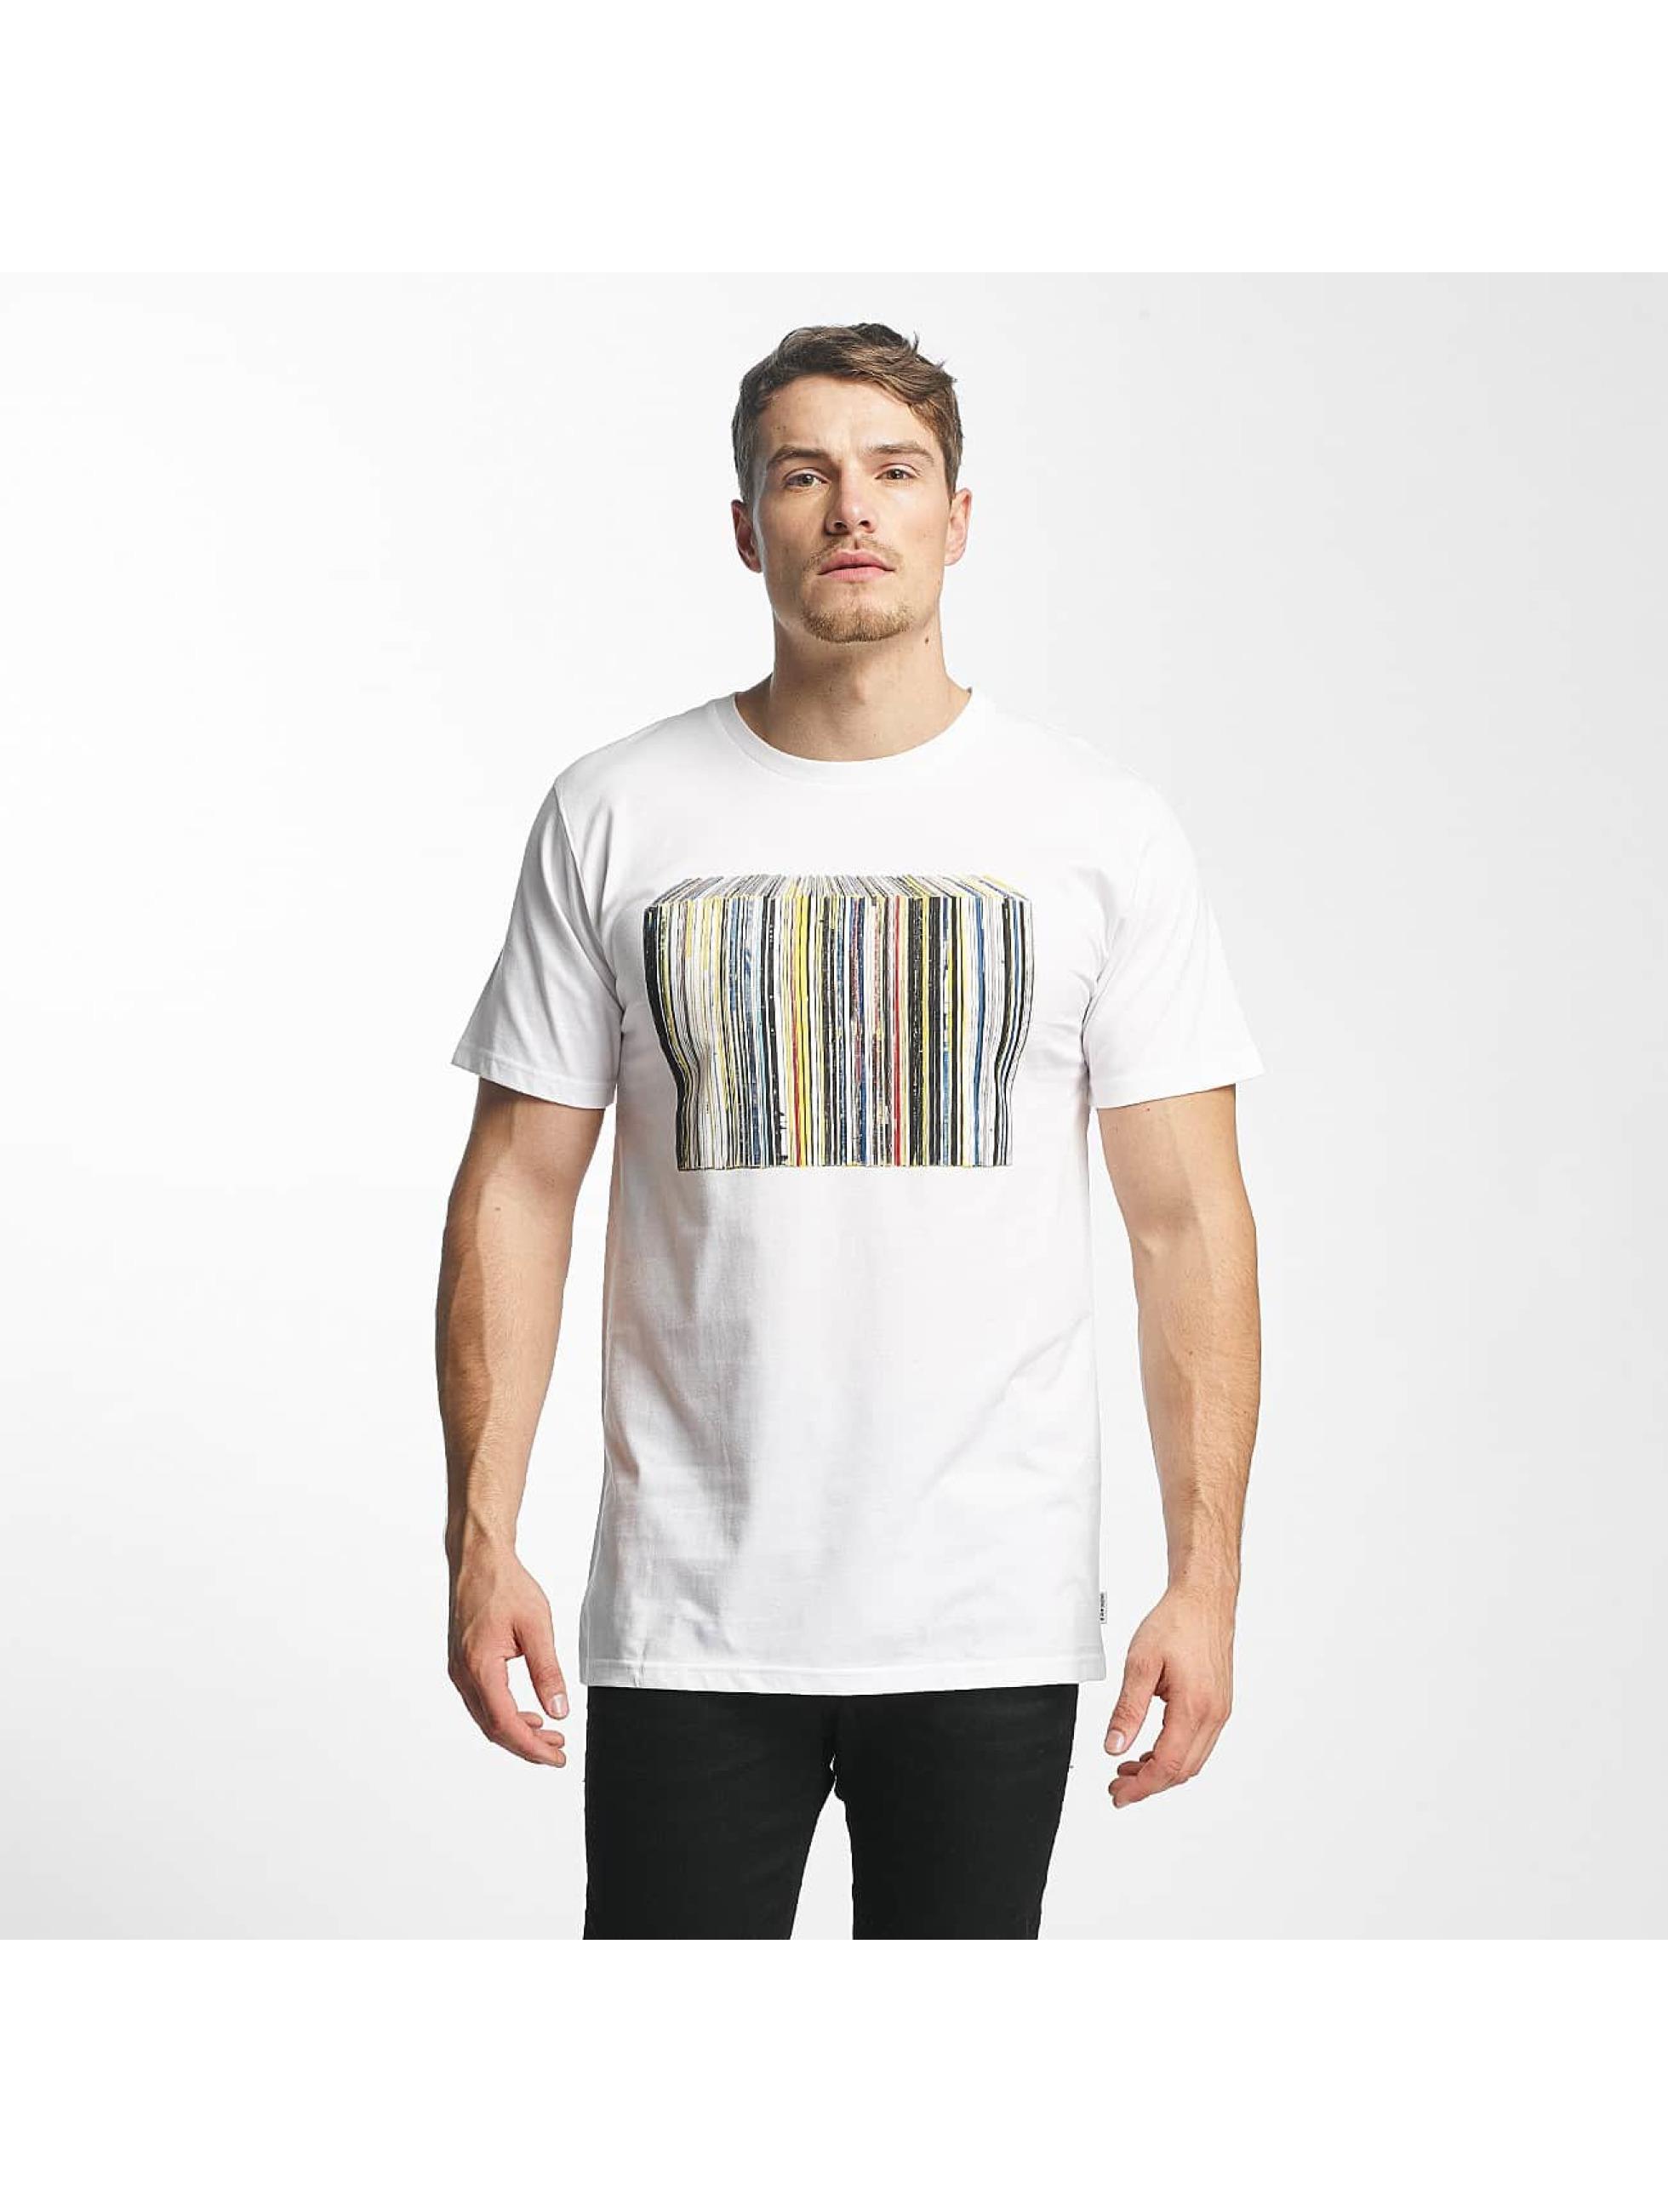 DEDICATED Männer T-Shirt Vinyl Collection in weiß